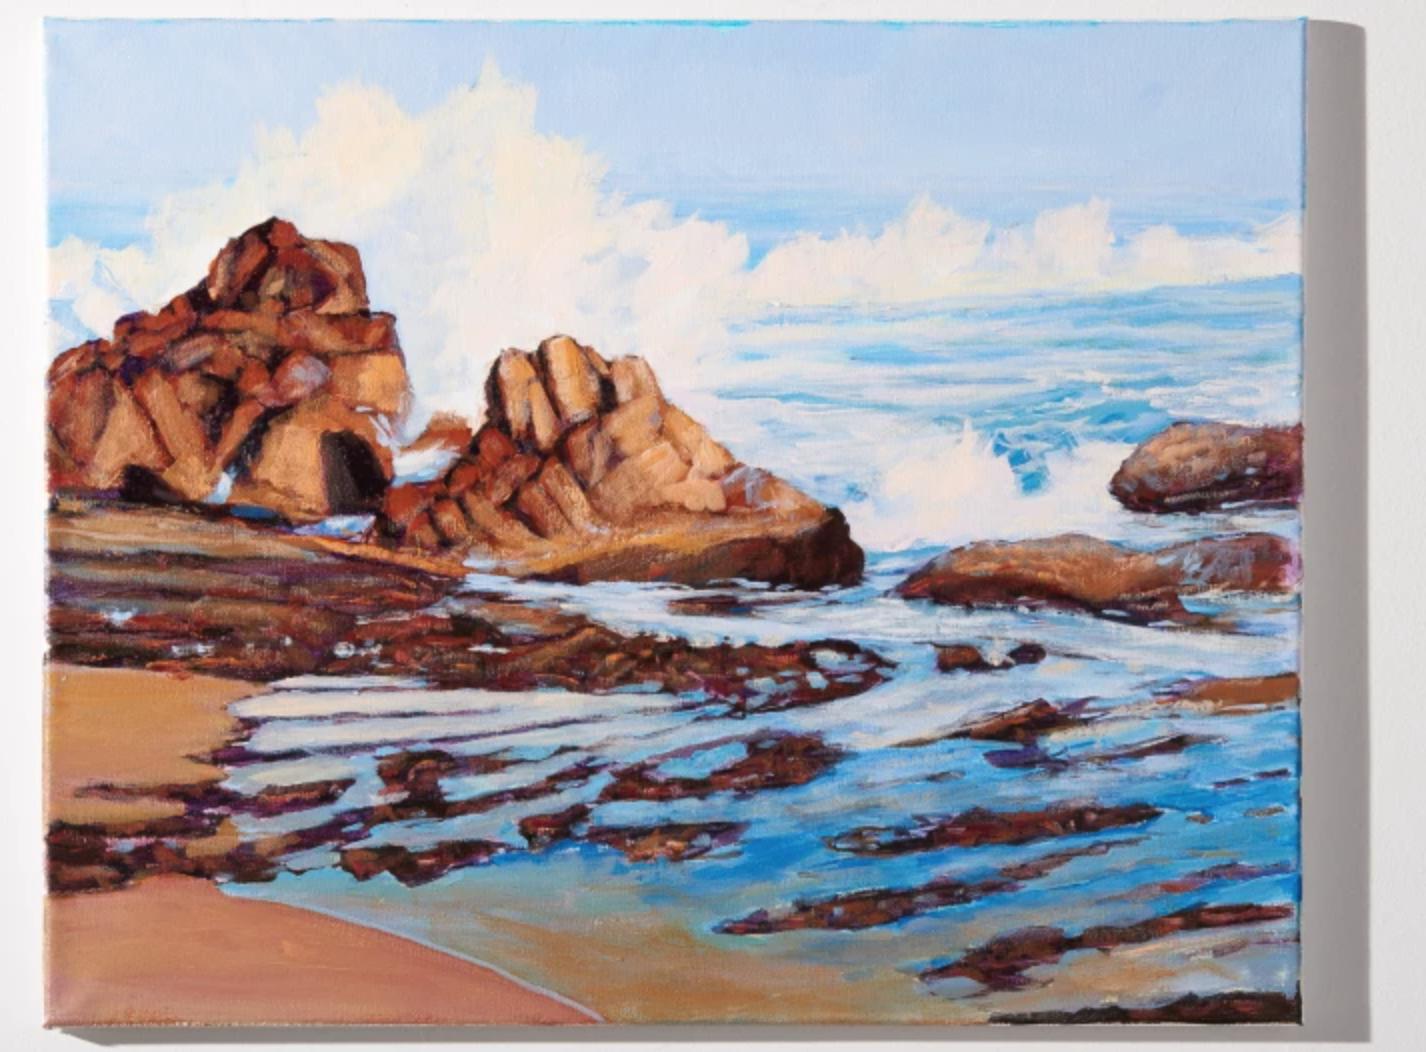 painted seascape